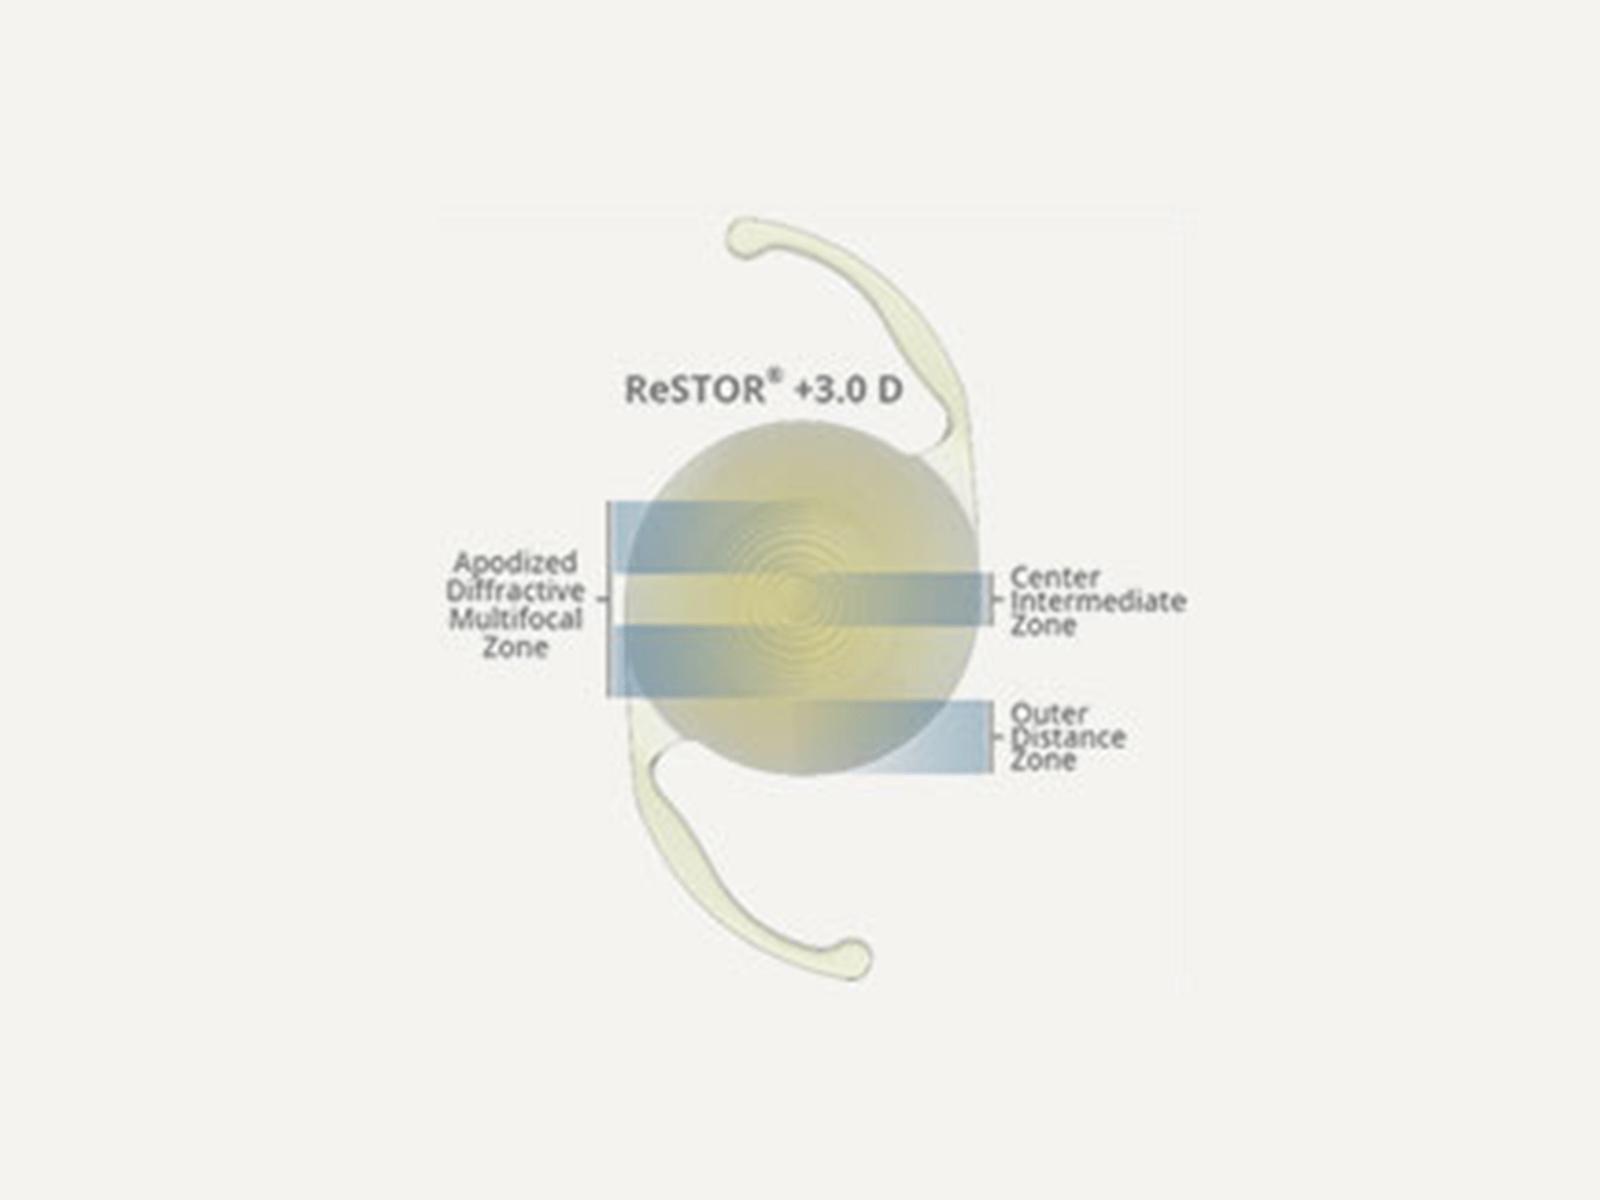 AcrySof IQ ReSTOR +3.0 D IOL (MN6AD1)